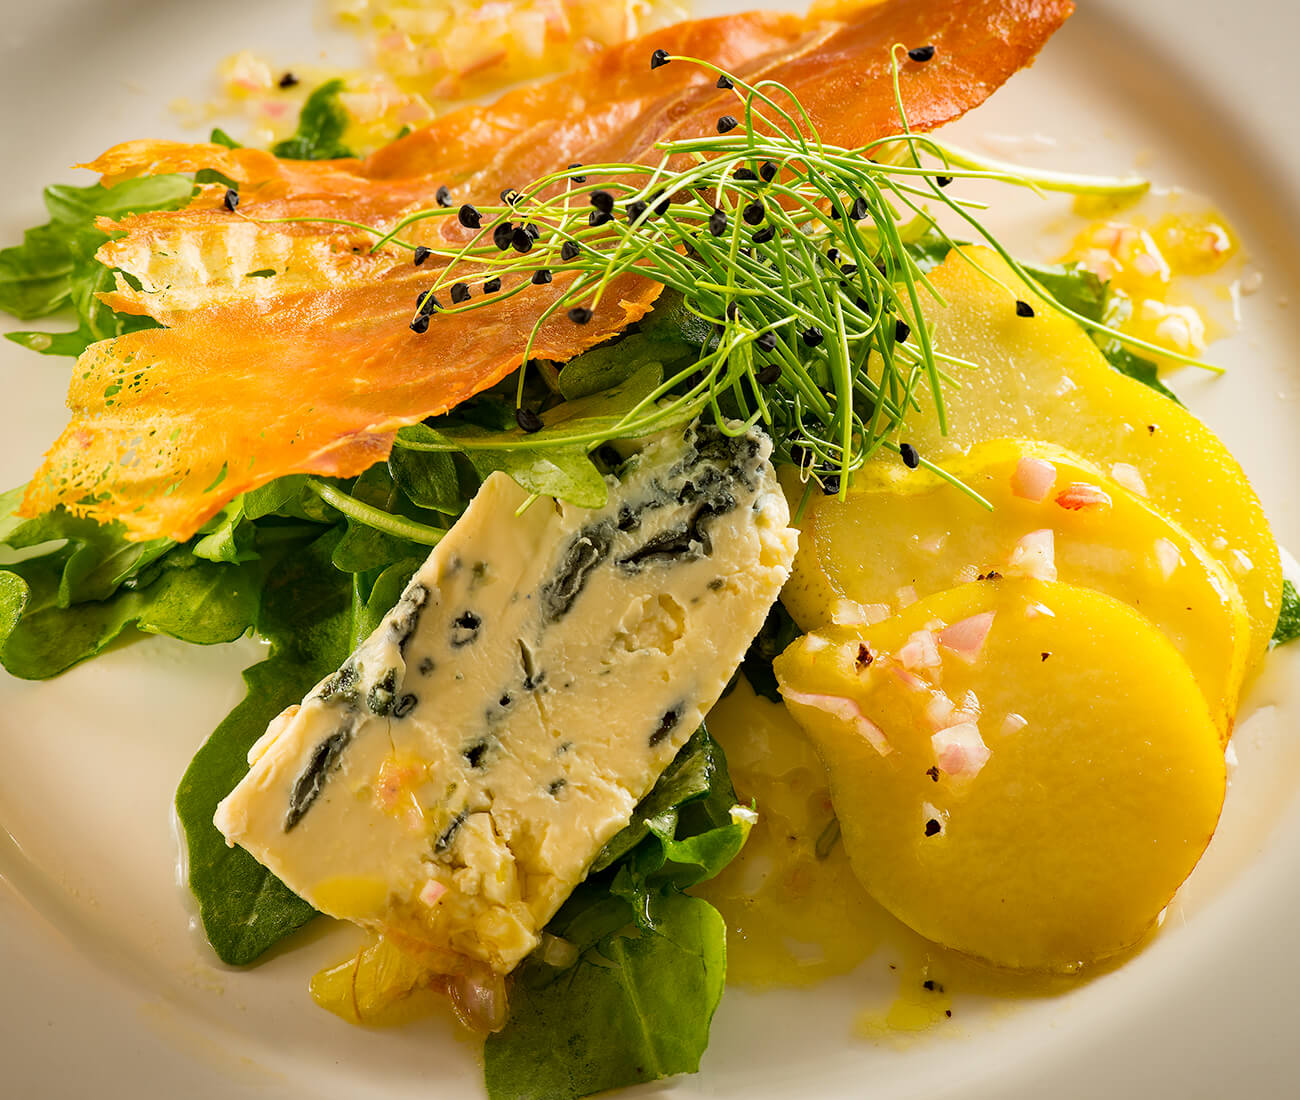 Image for Arugula, Asian Pear & Prosciutto Salad